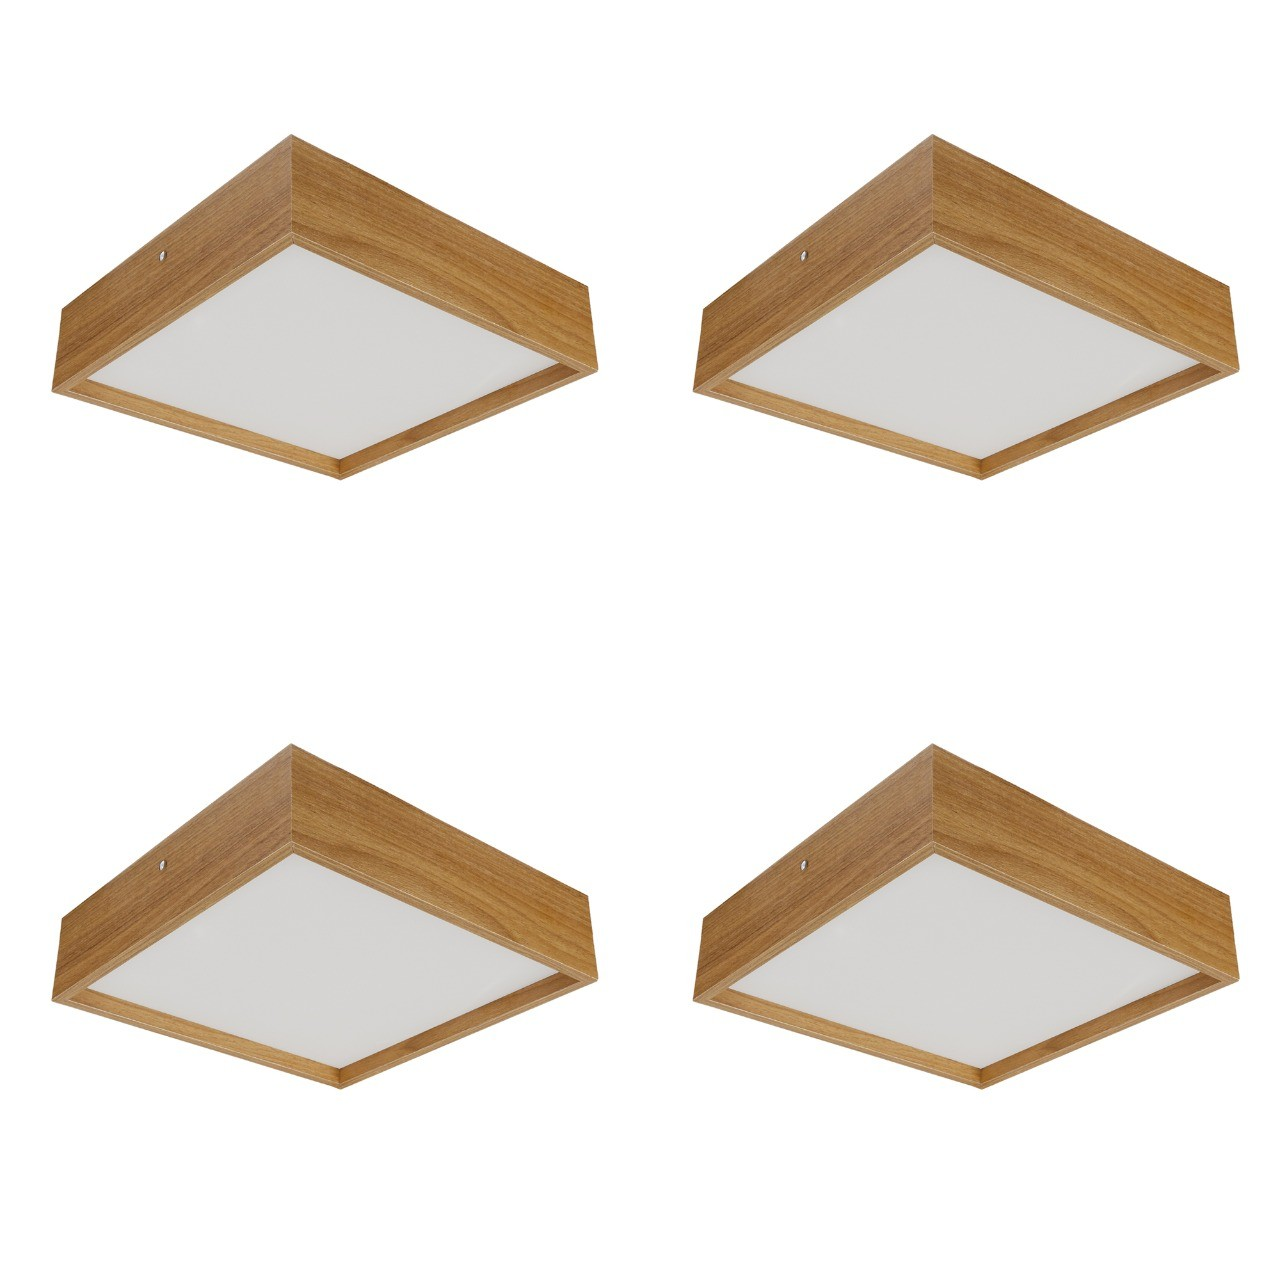 Kit 4 Plafons Quadrado Madeira 30X30 2 Luzes Freijó